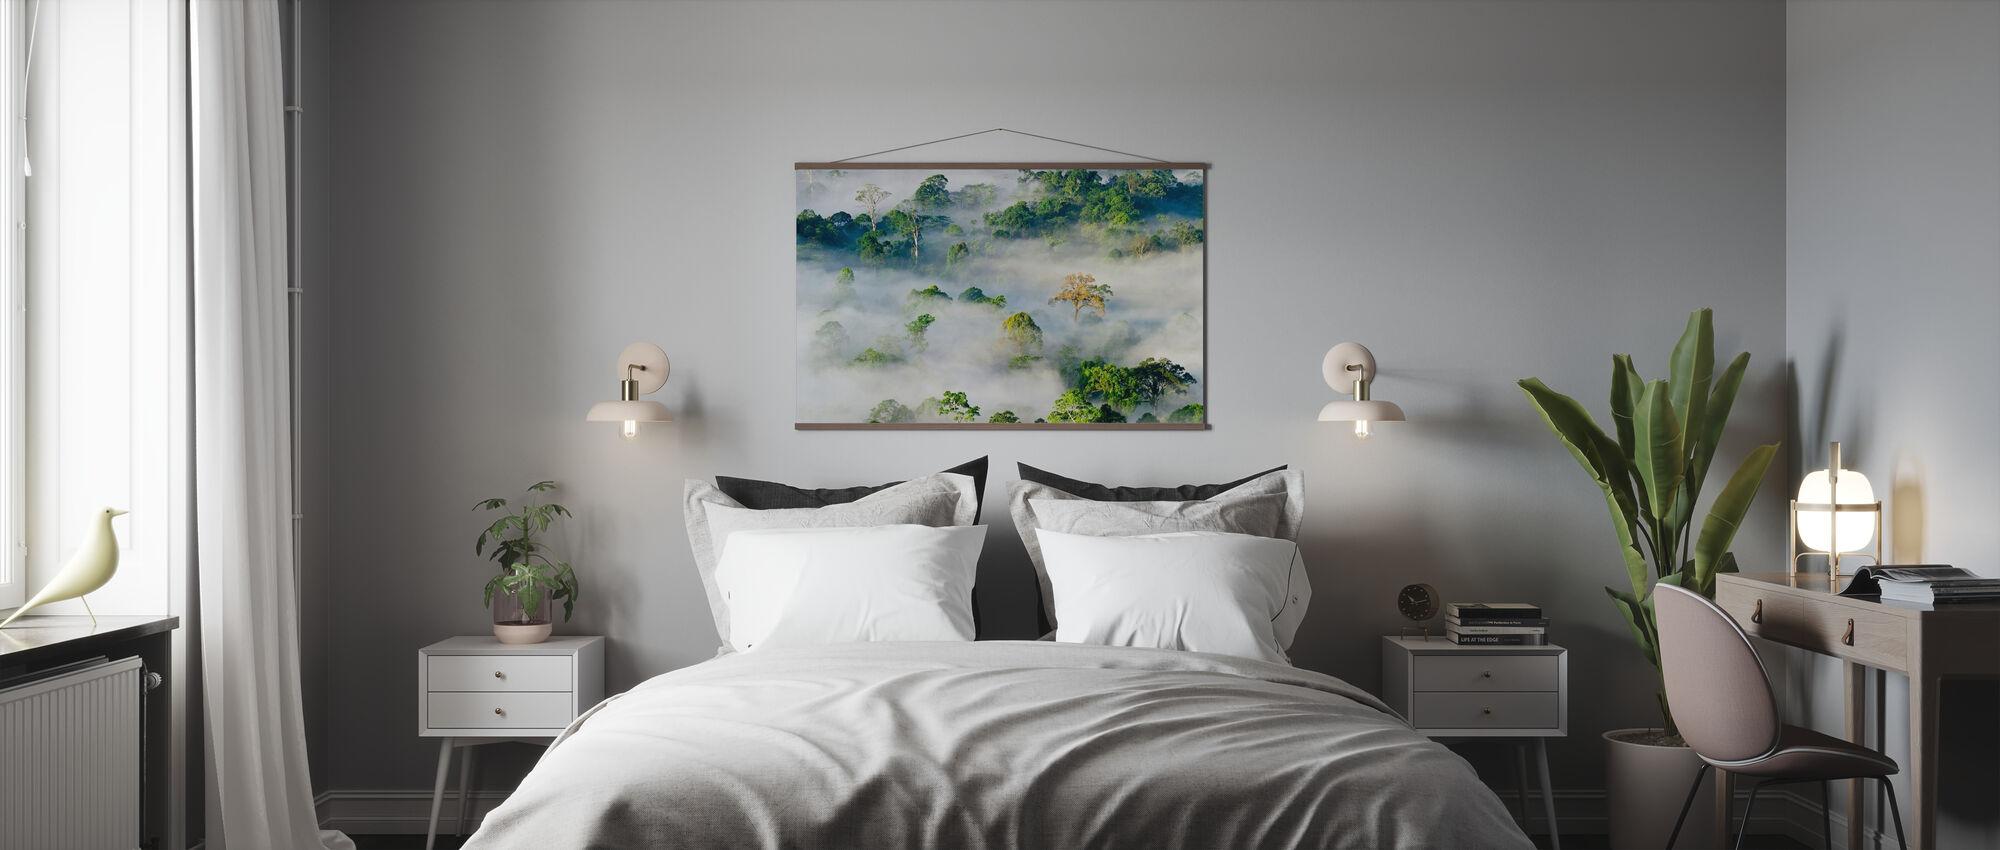 Tiefland Dipterocarp Regenwald - Poster - Schlafzimmer